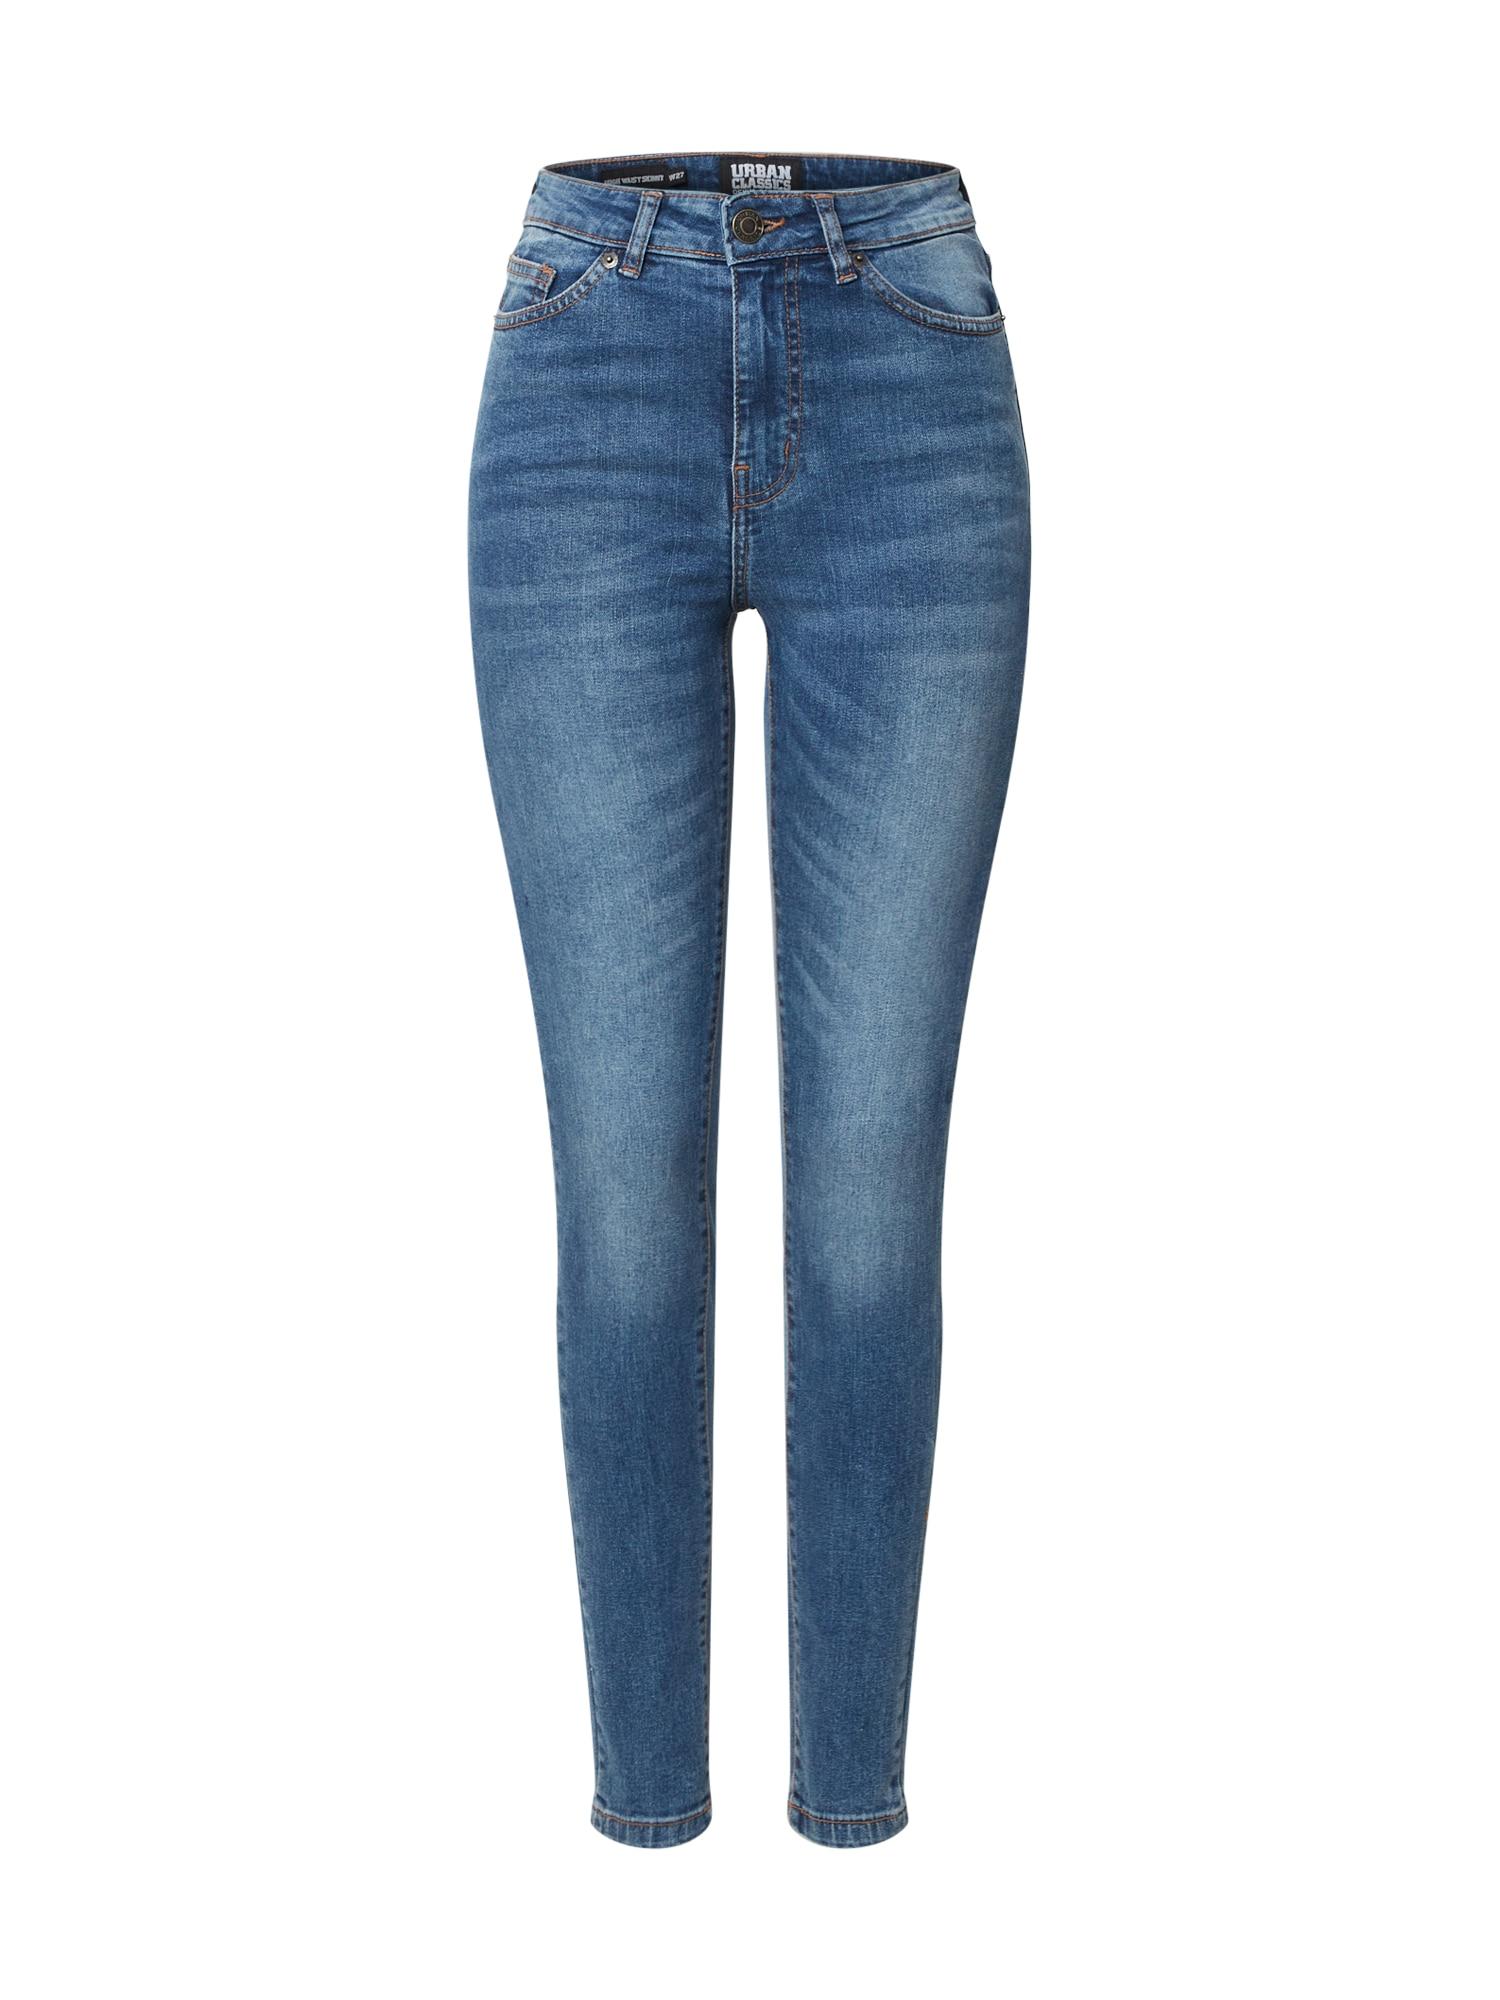 Urban Classics Džínsy 'Ladies High Waist Skinny Jeans'  modrá denim